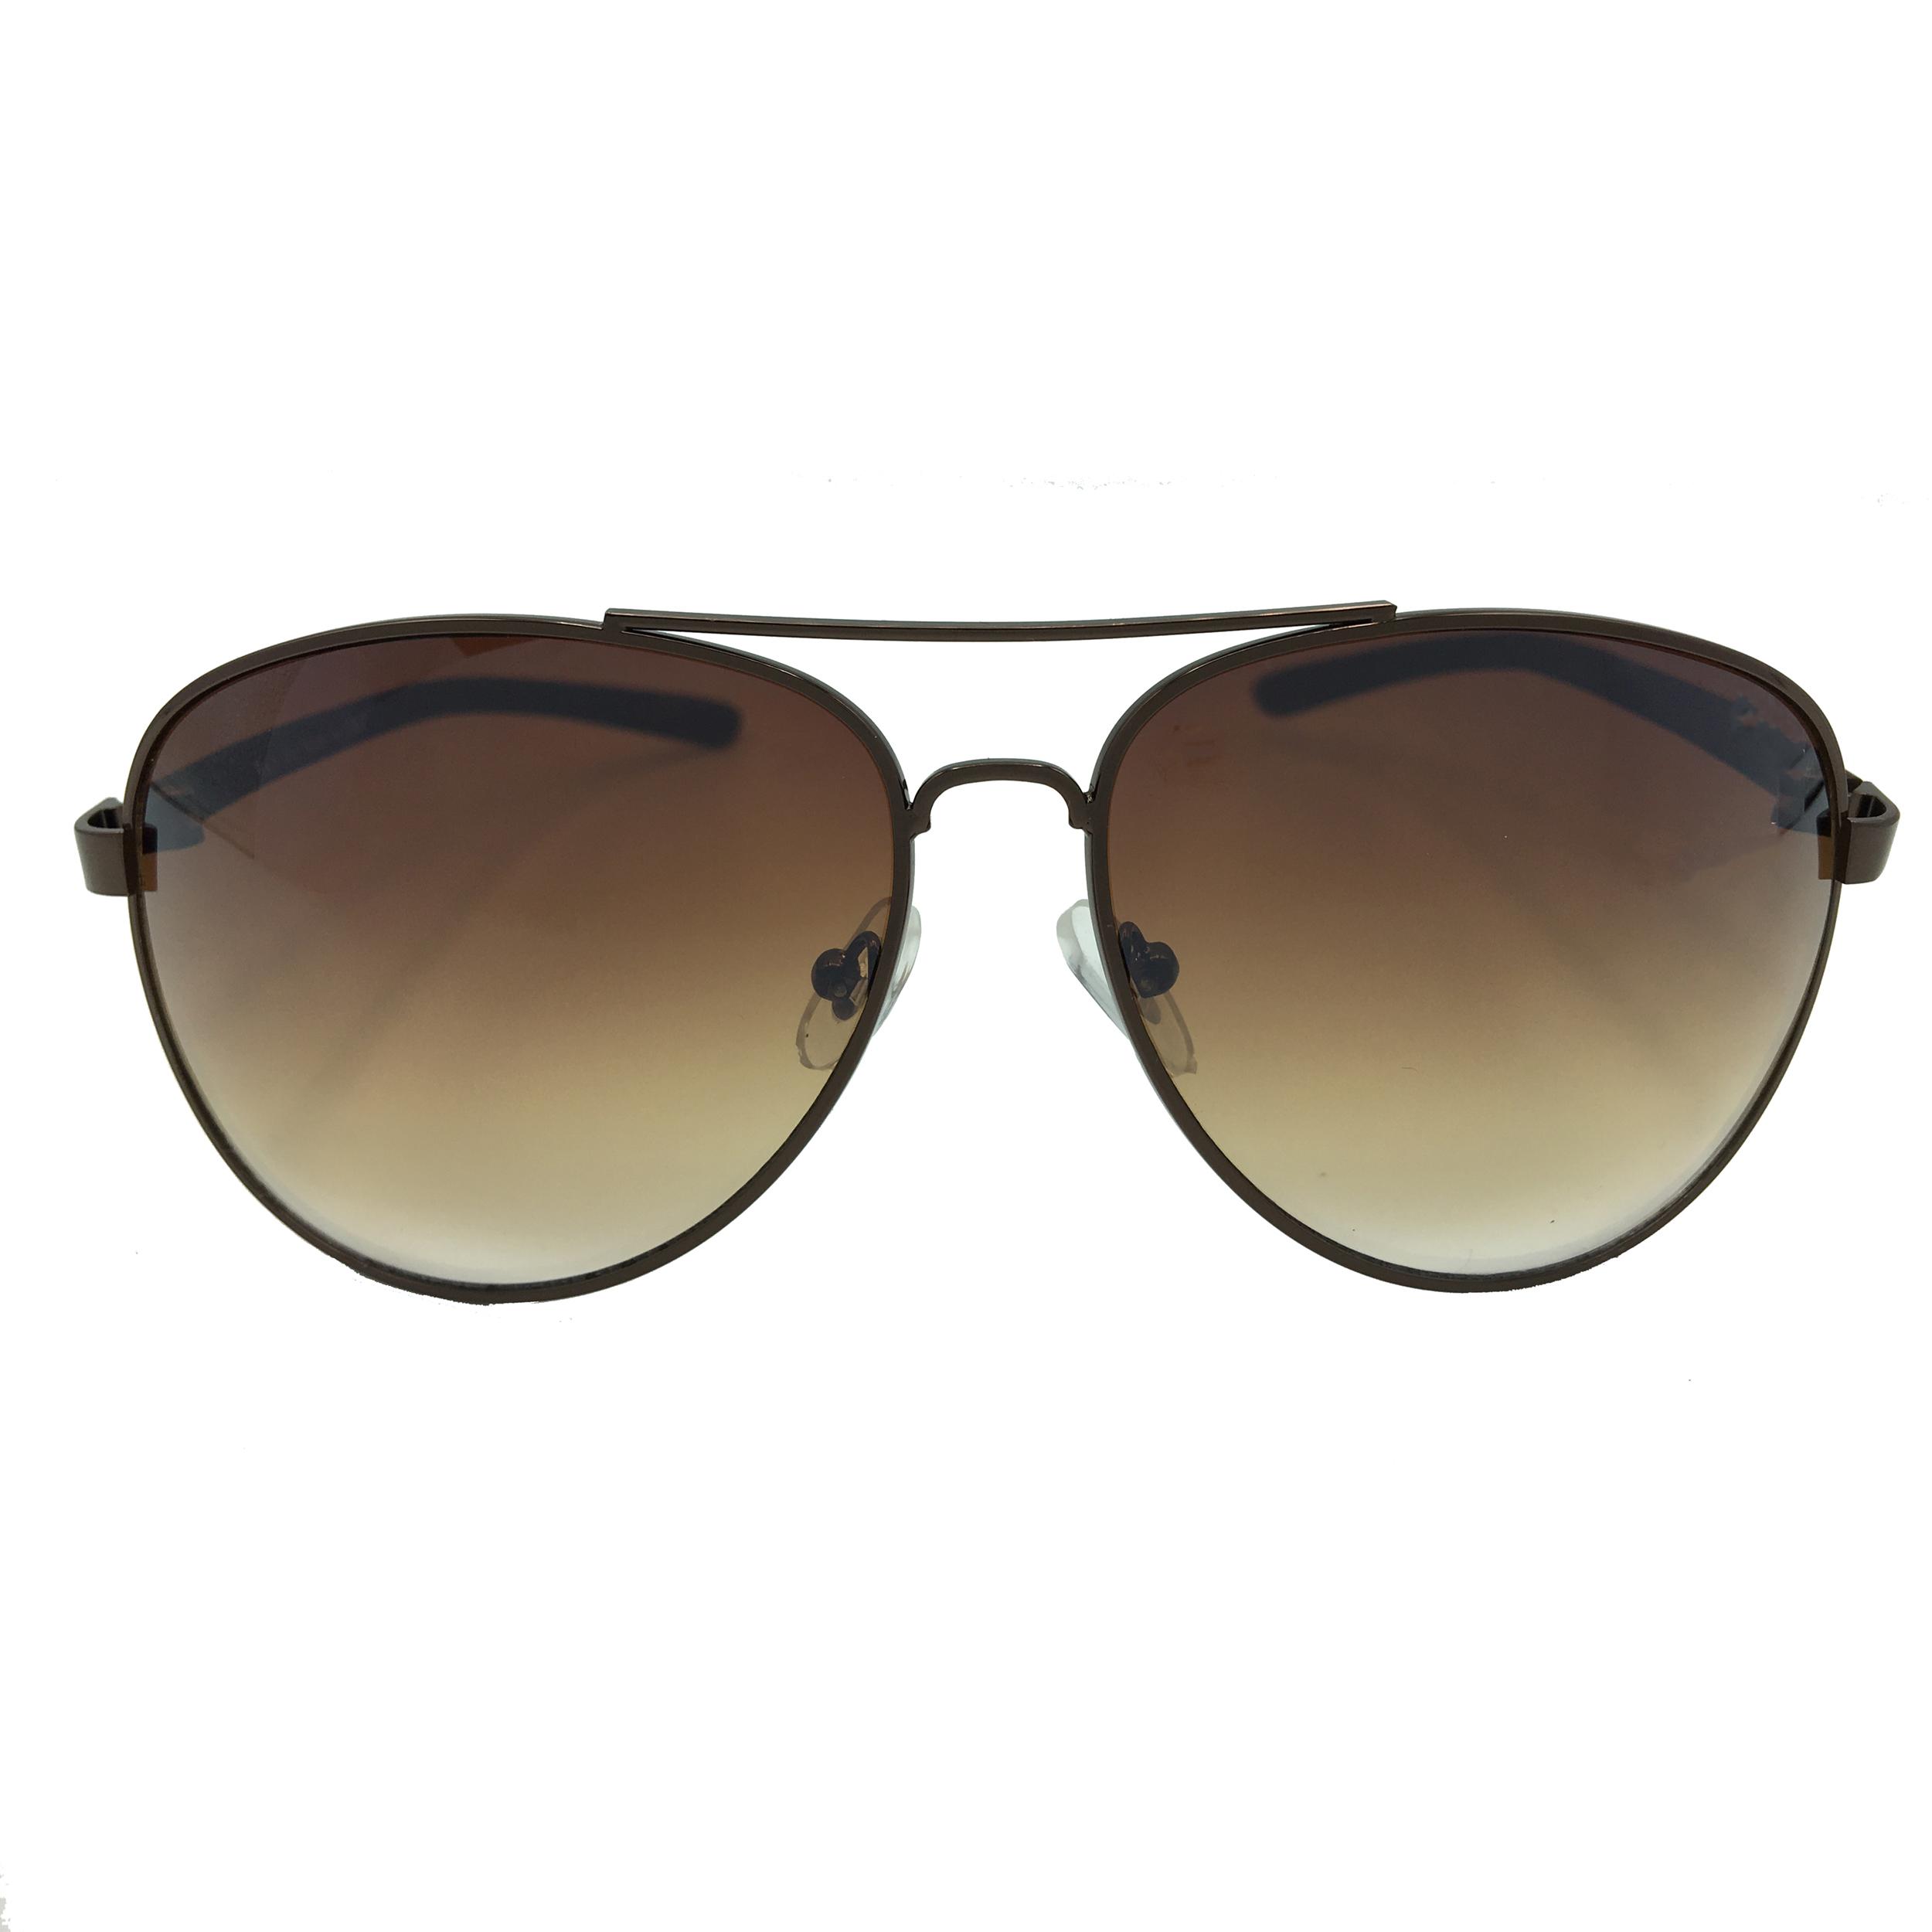 عینک آفتابی کد Re8230